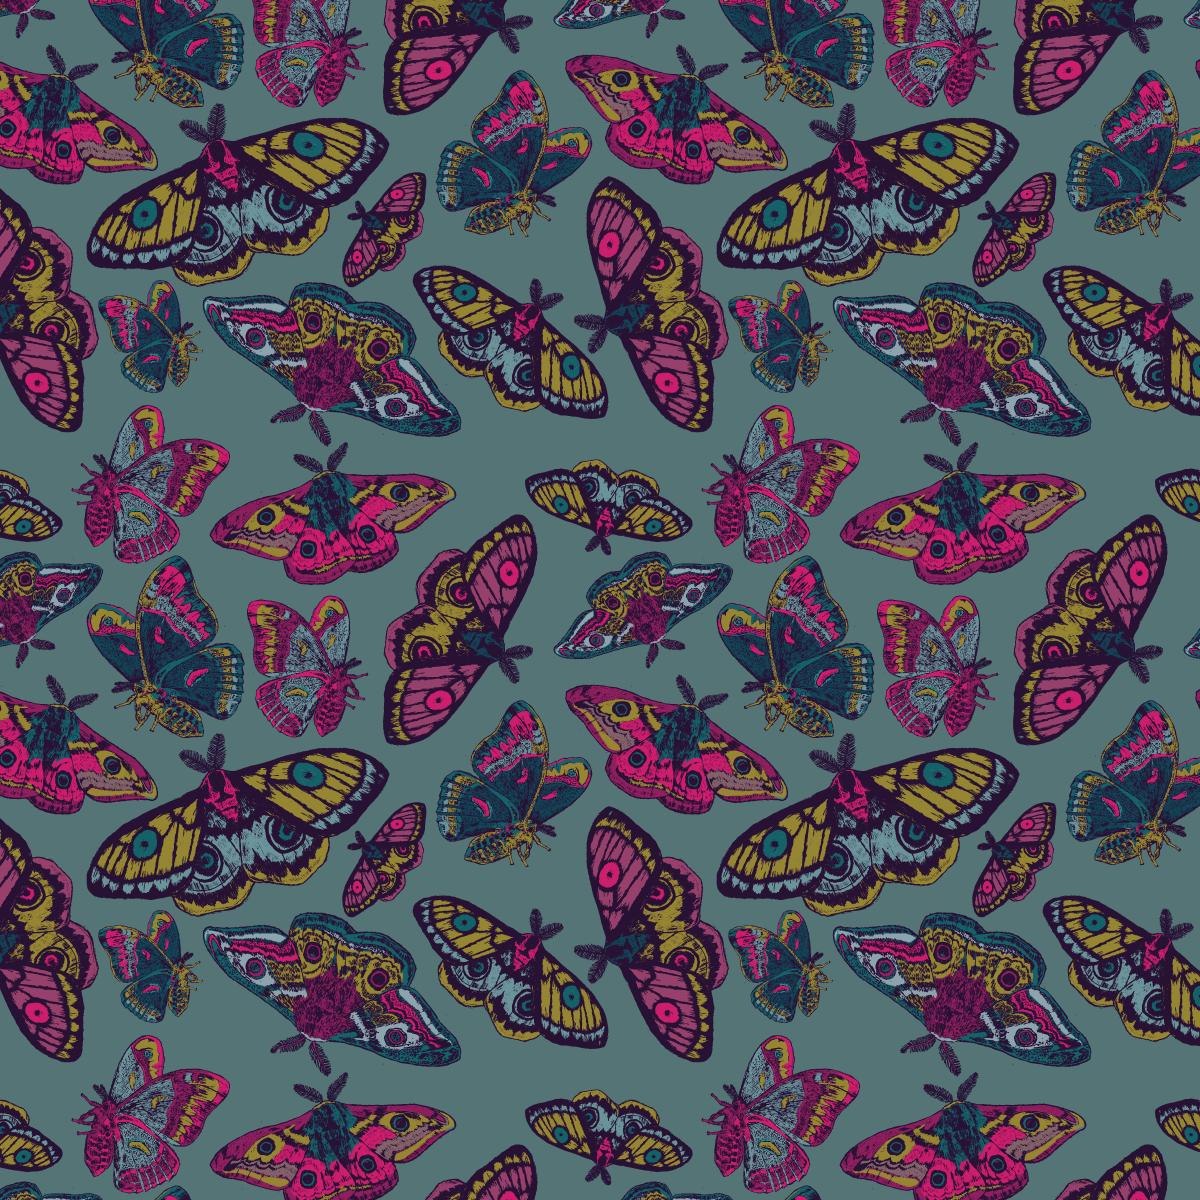 moths-8.png